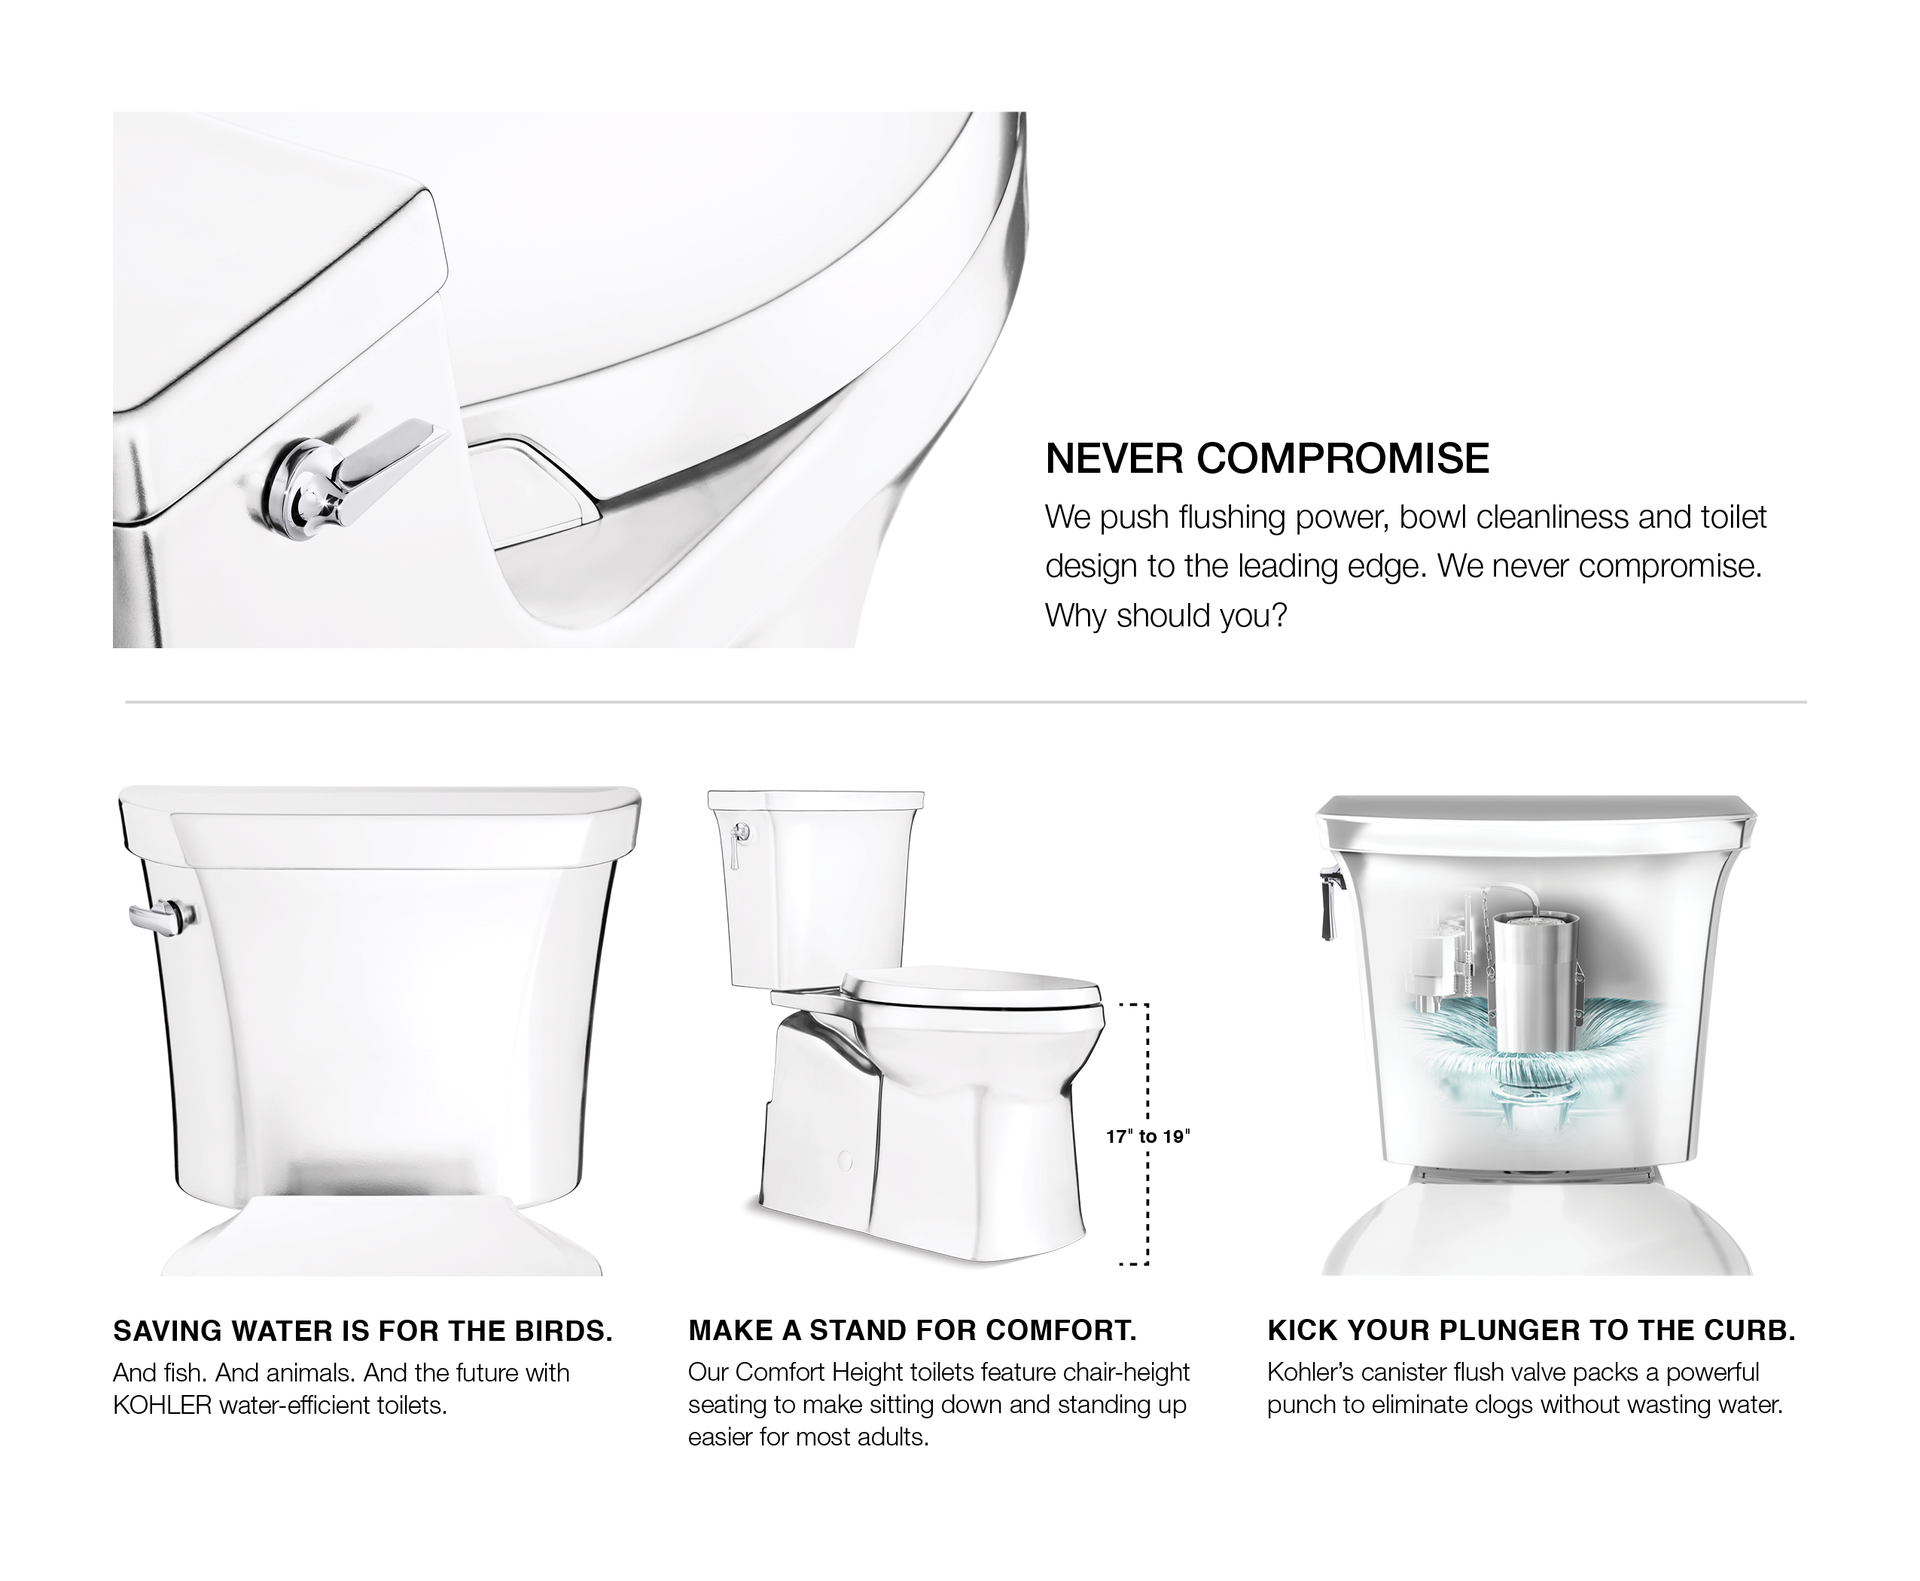 Kohler Adair White Watersense Elongated Chair Height Toilet 12 In Rough In Size Ada Compliant Lowes Com Water Sense Kohler Chair Height